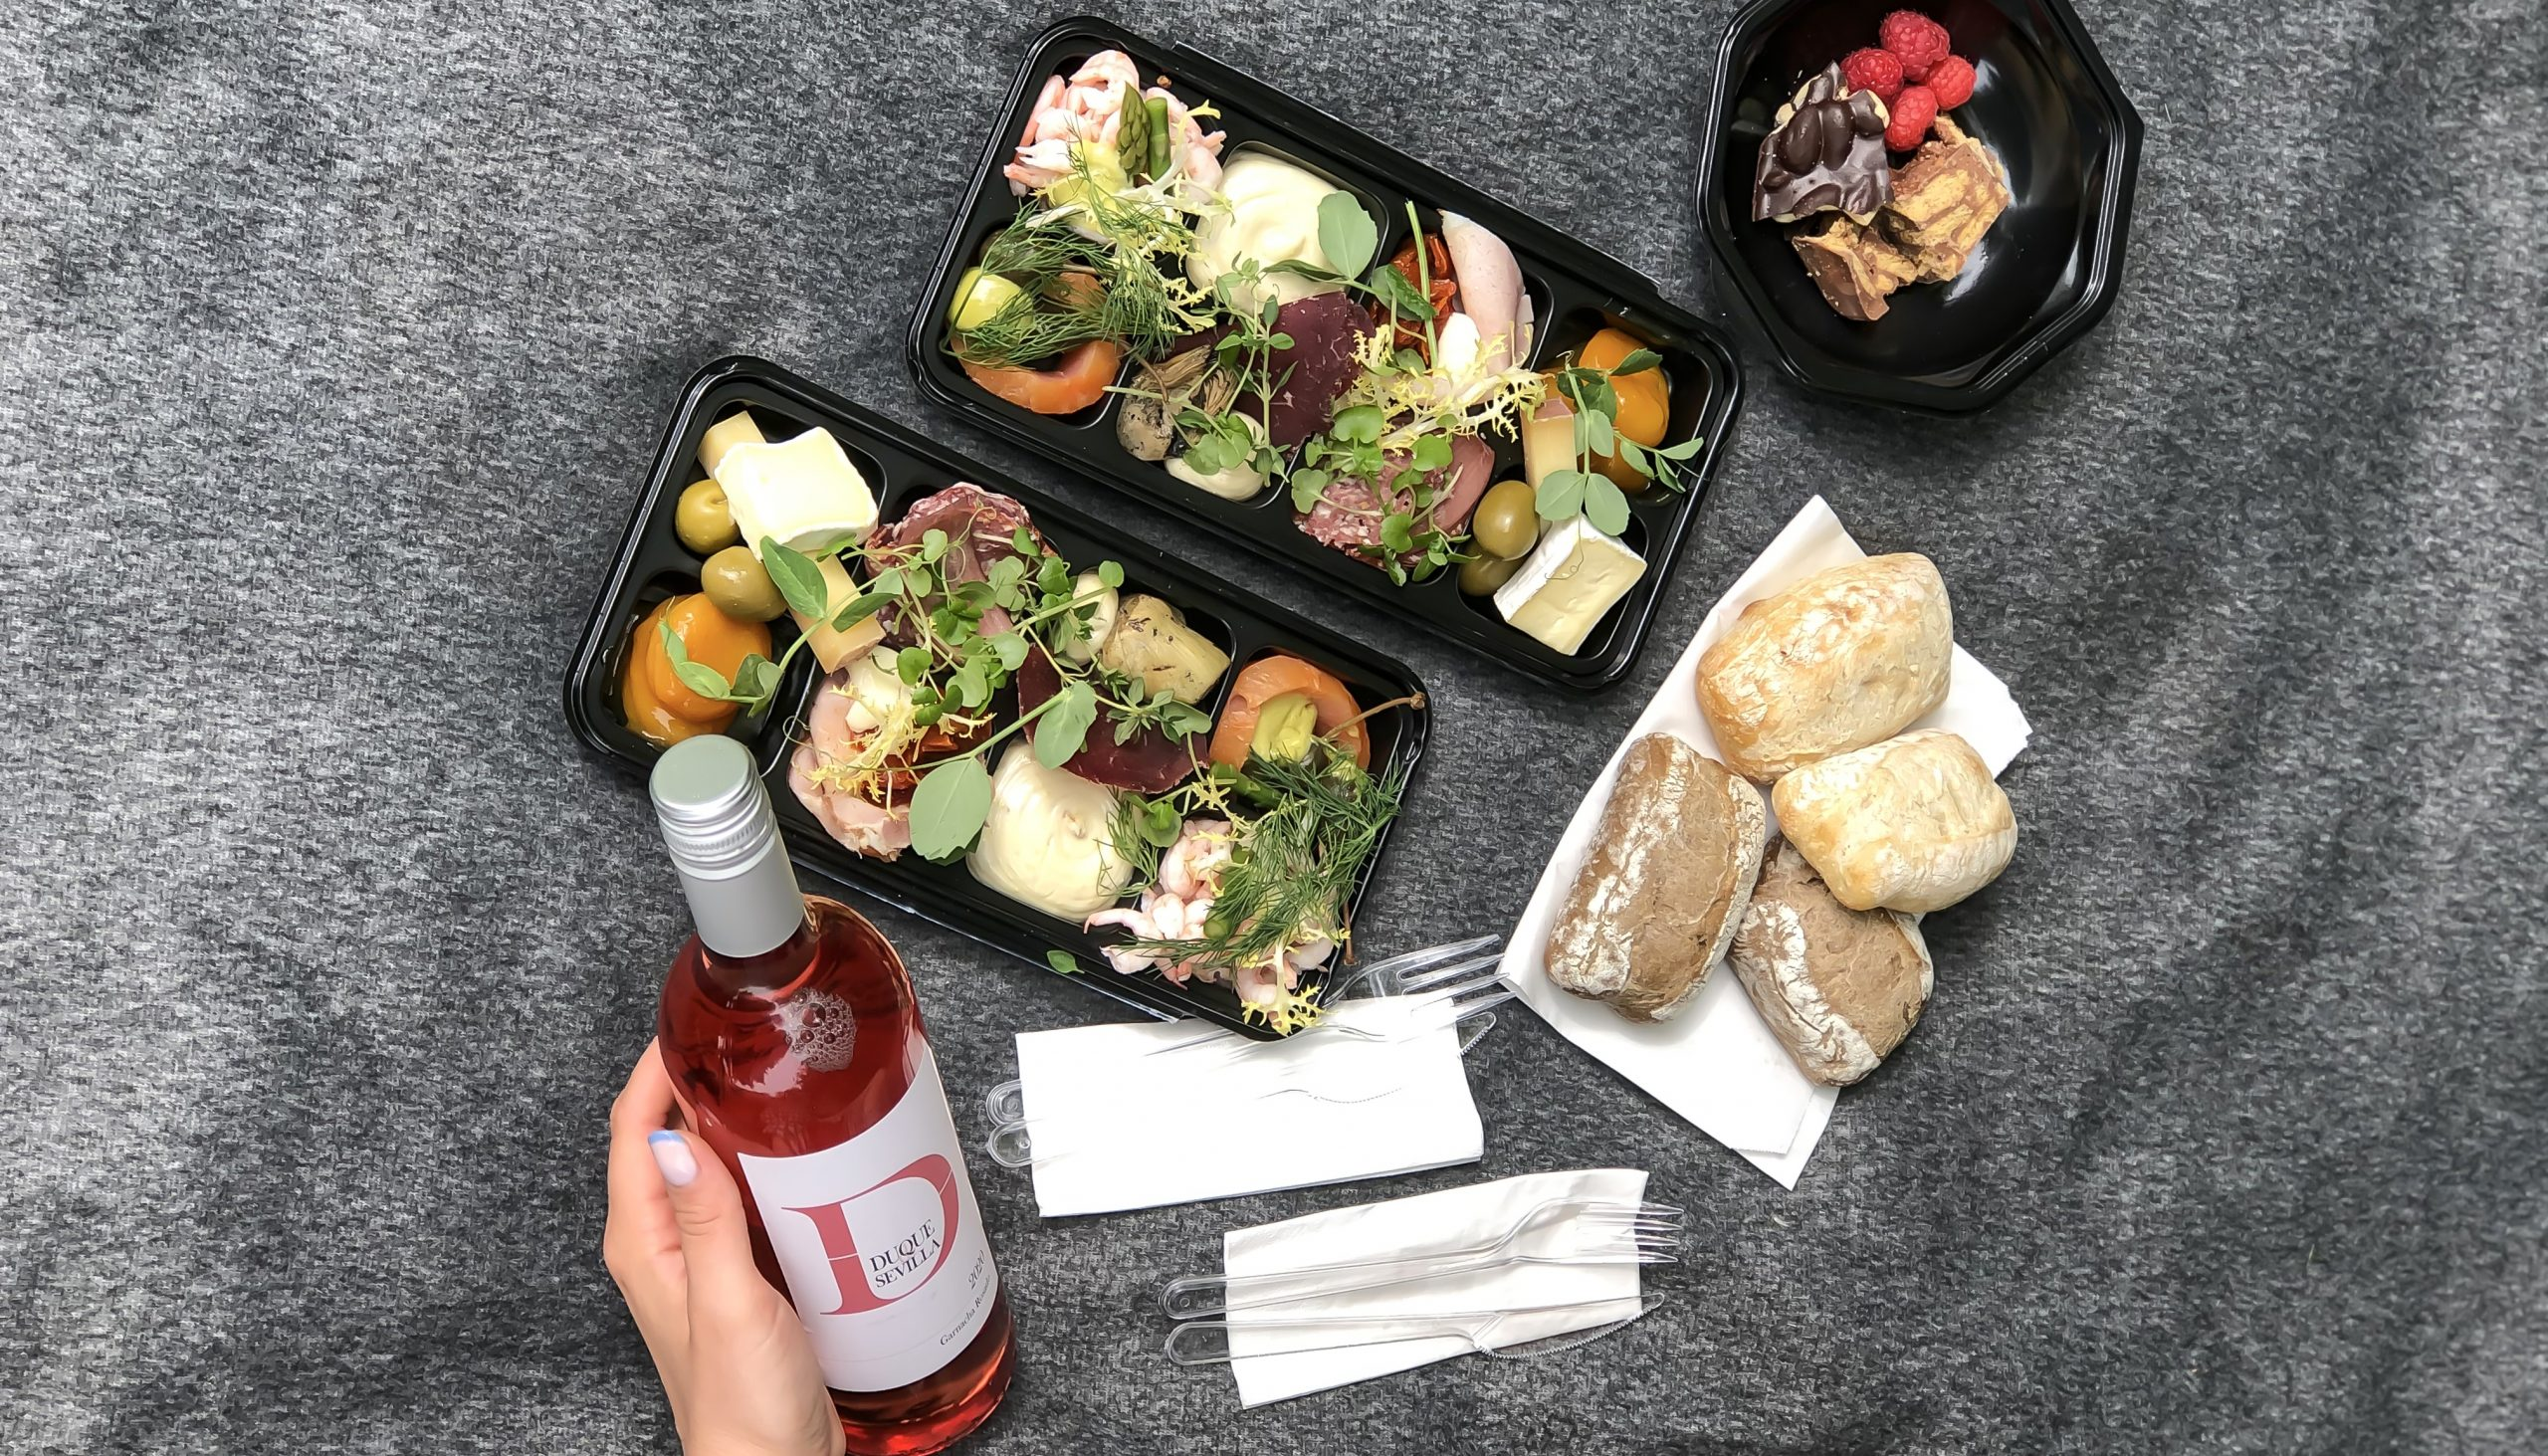 Sidste chance: Få en picnickurv med tapas og vin til 2 personer til 210 kr.